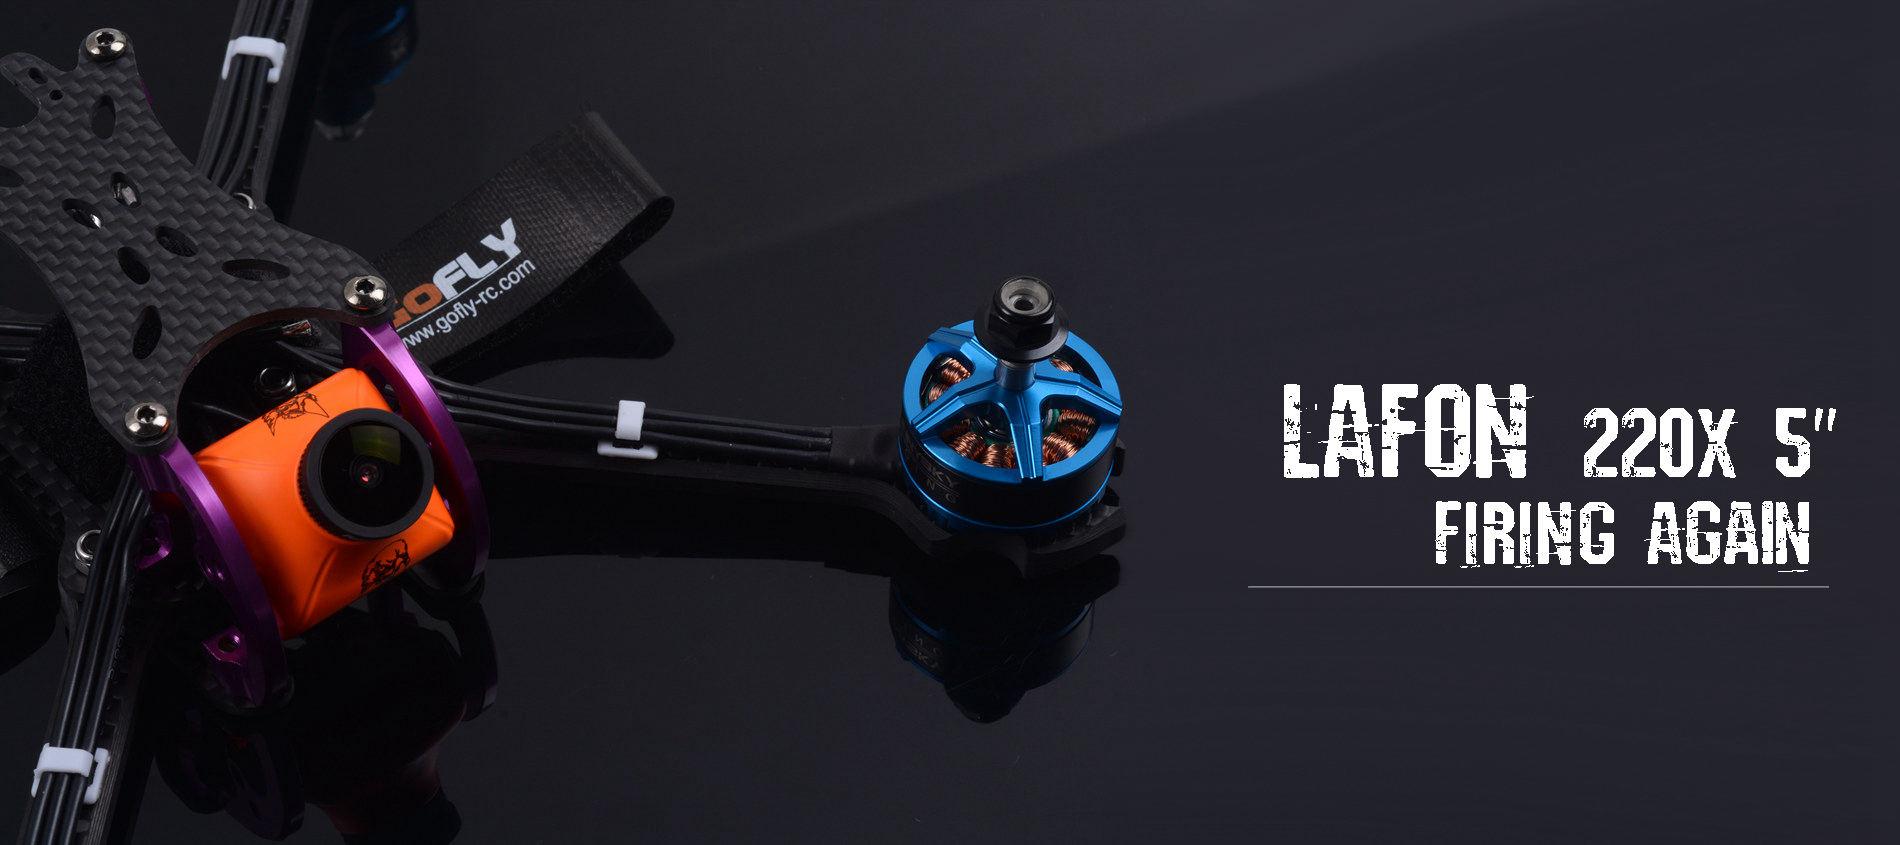 GOFLY-RC LAFON 220mm FPV RACING DRONE